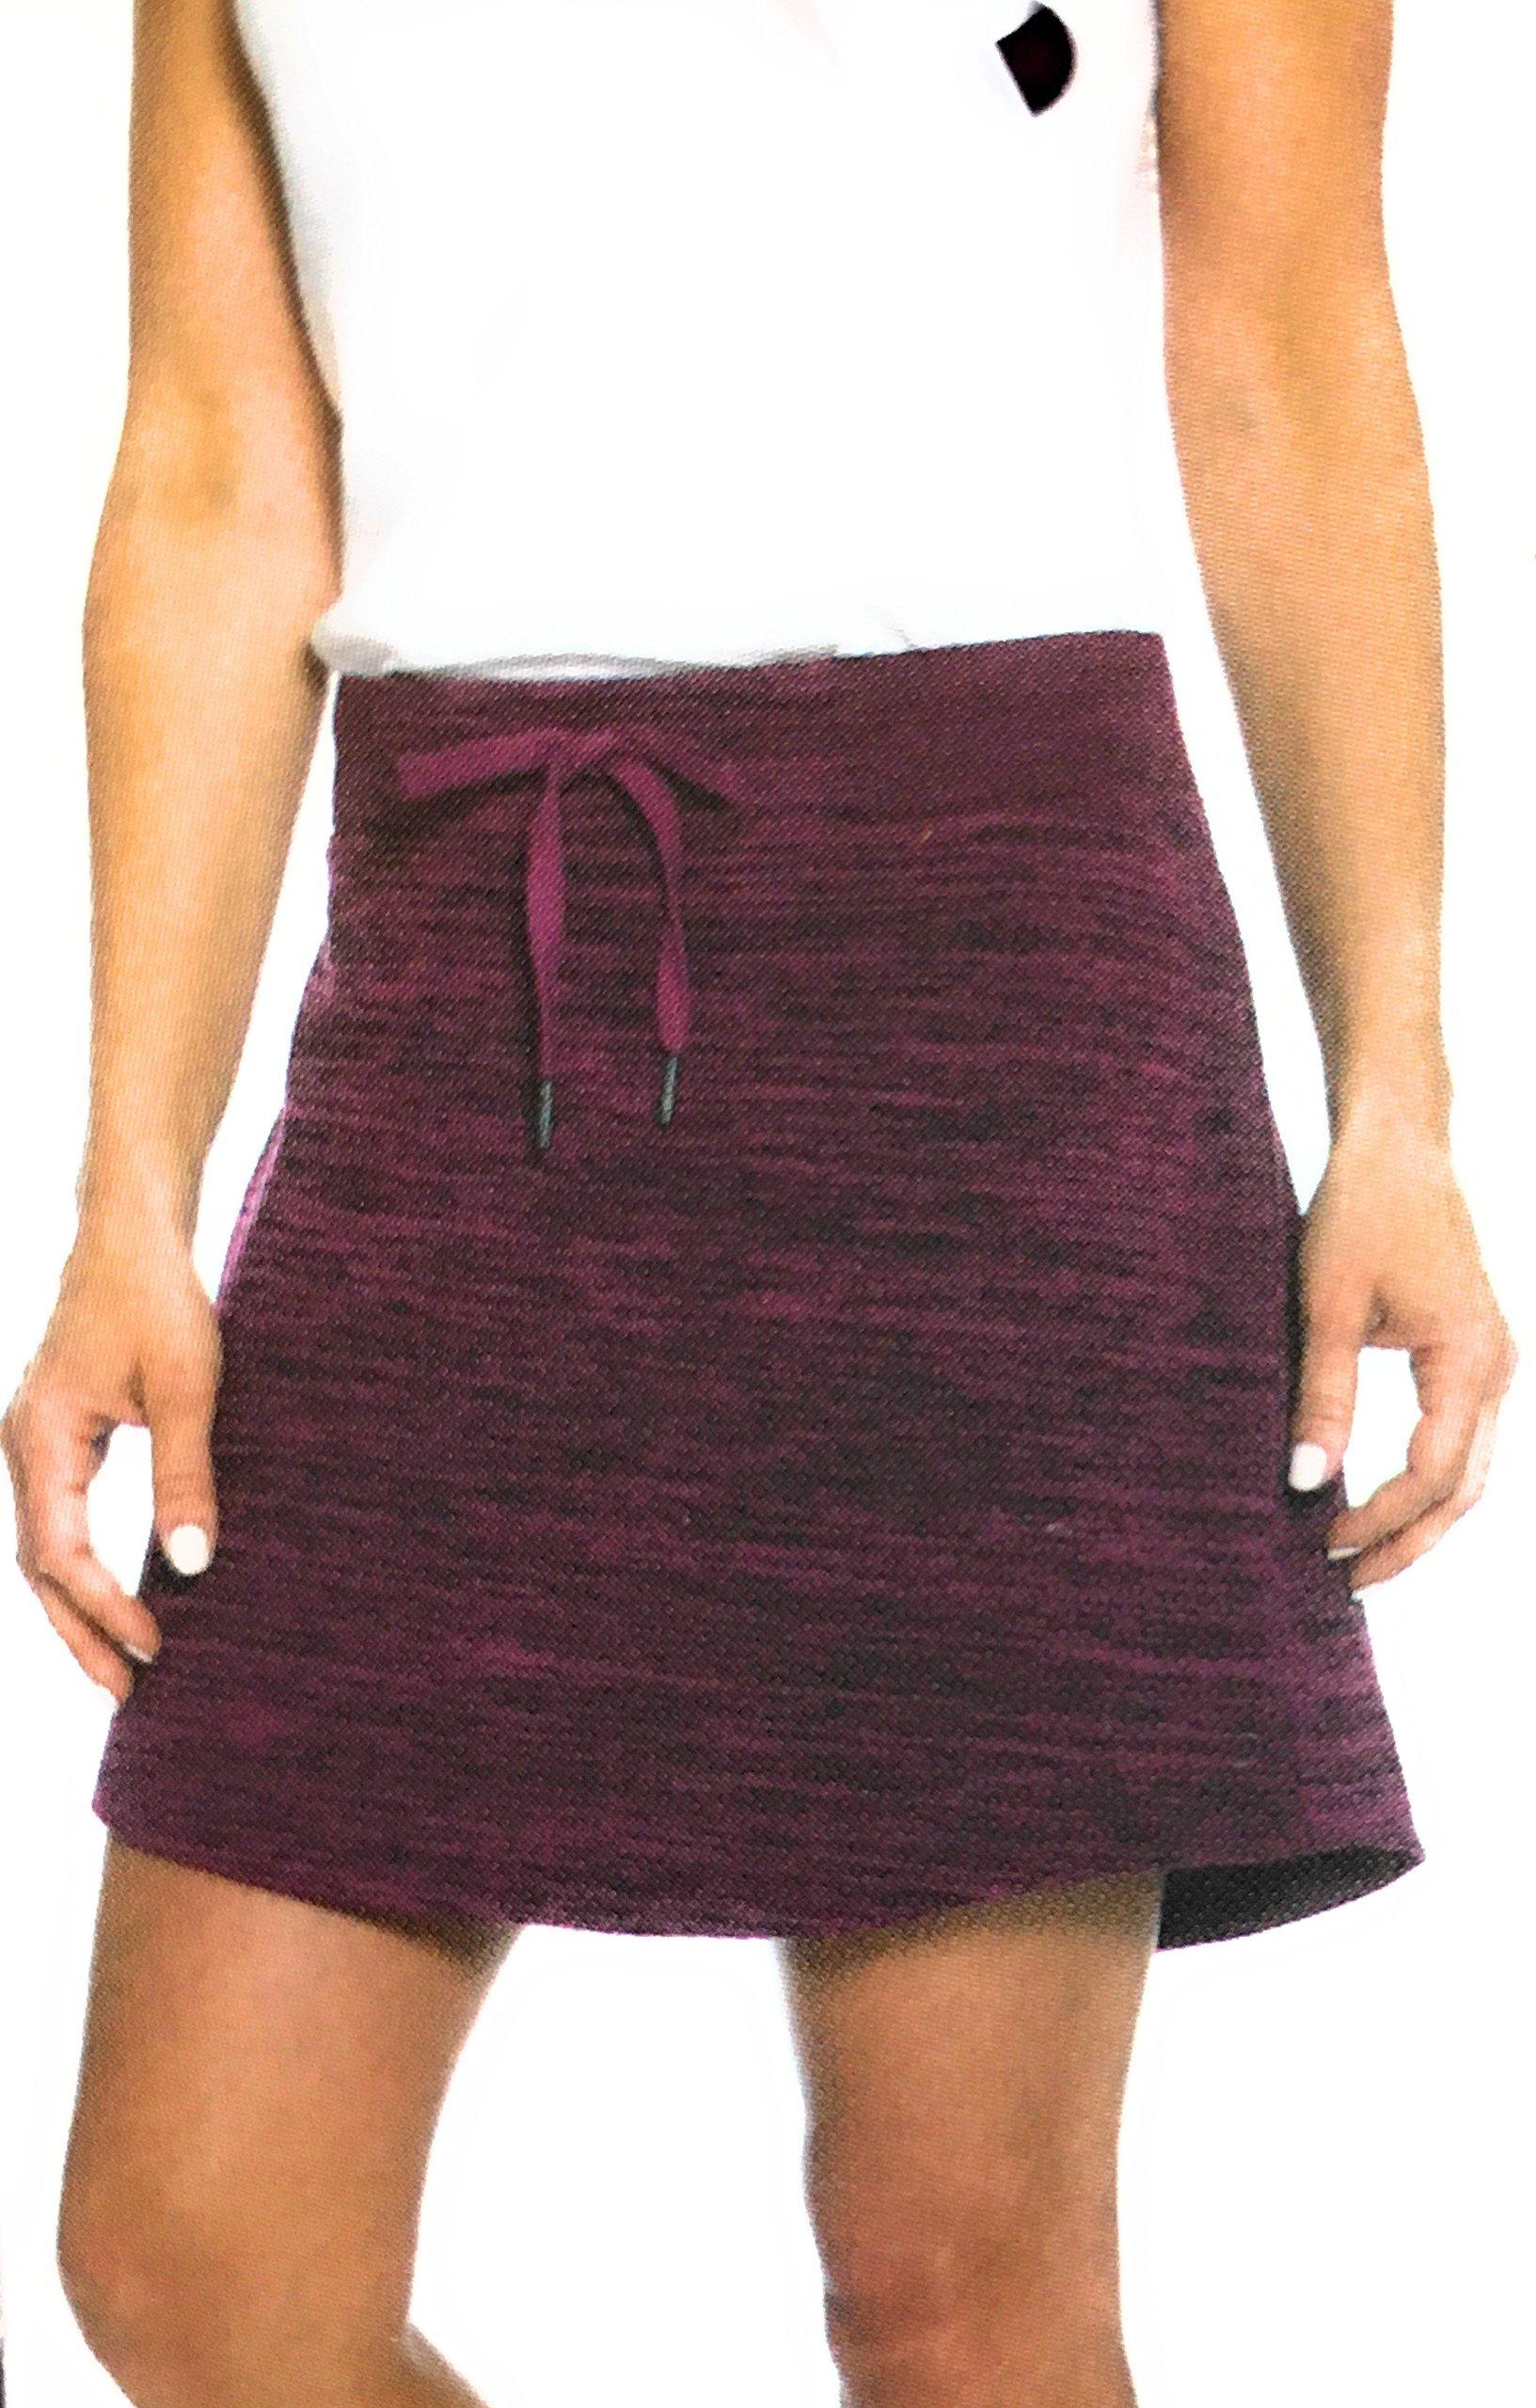 Gerry Women's Skort with Inner Short. (Small)